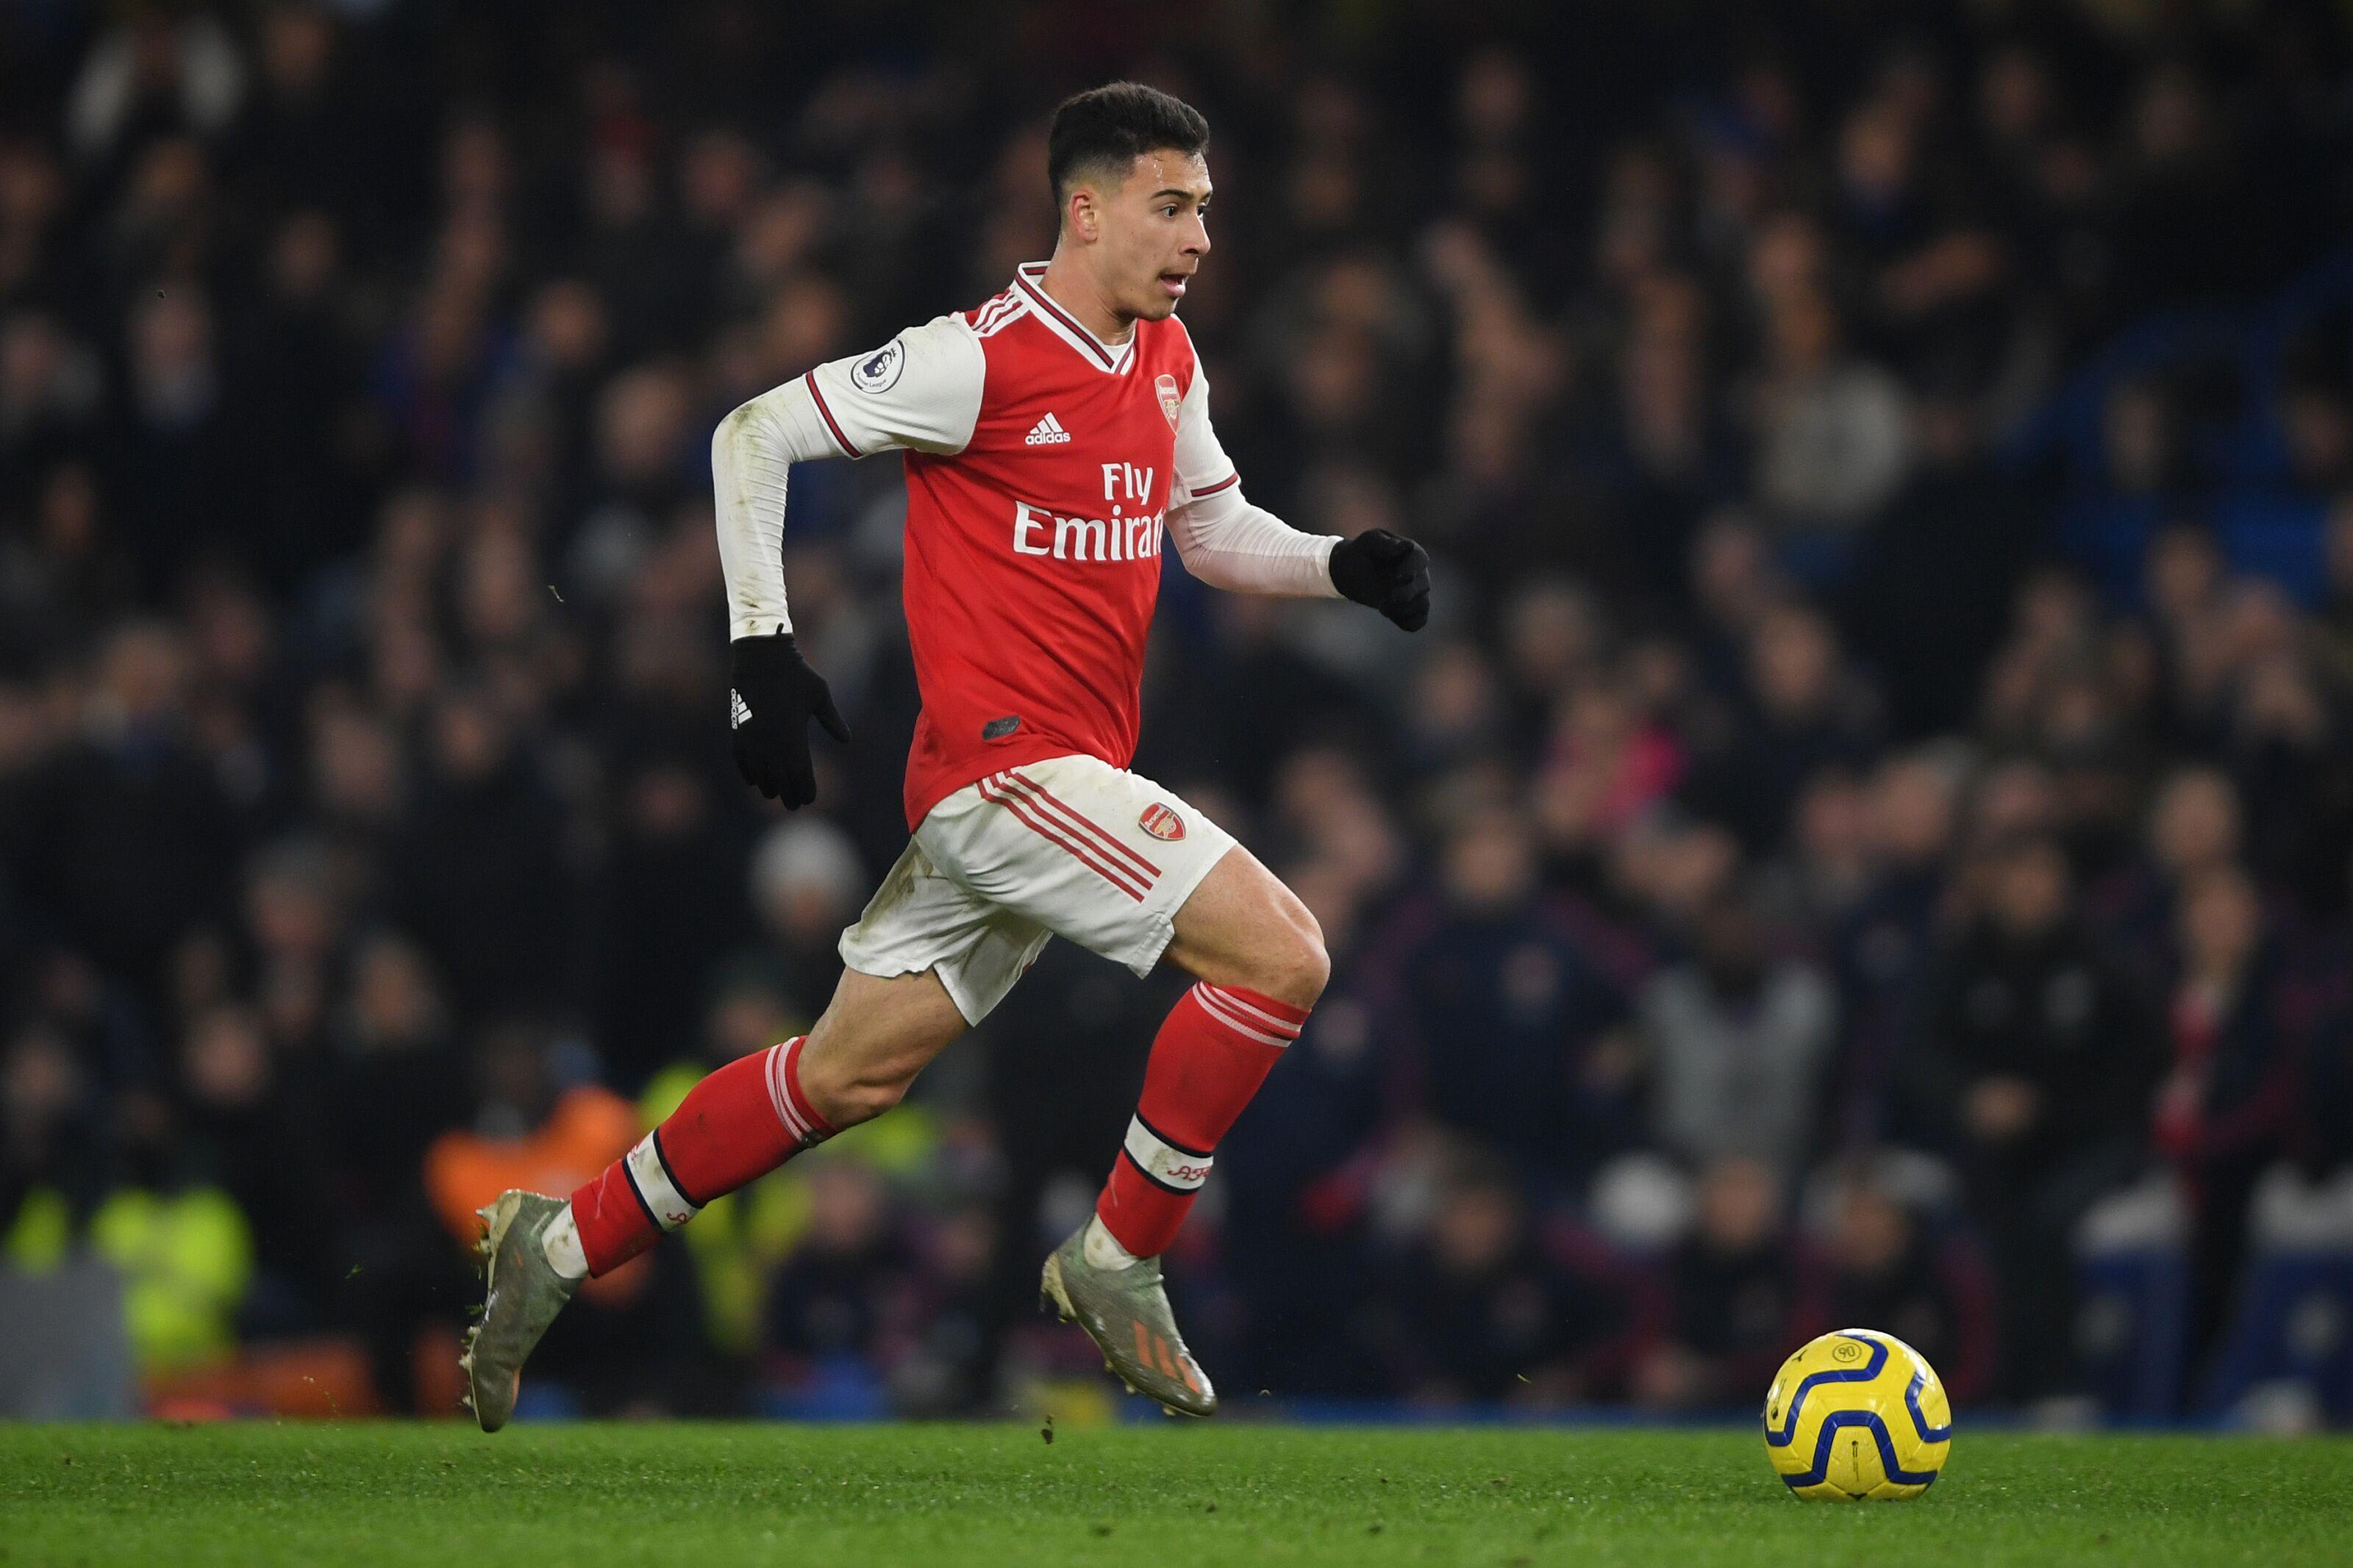 Arsenal: Gabriel Martinelli has to start, right?